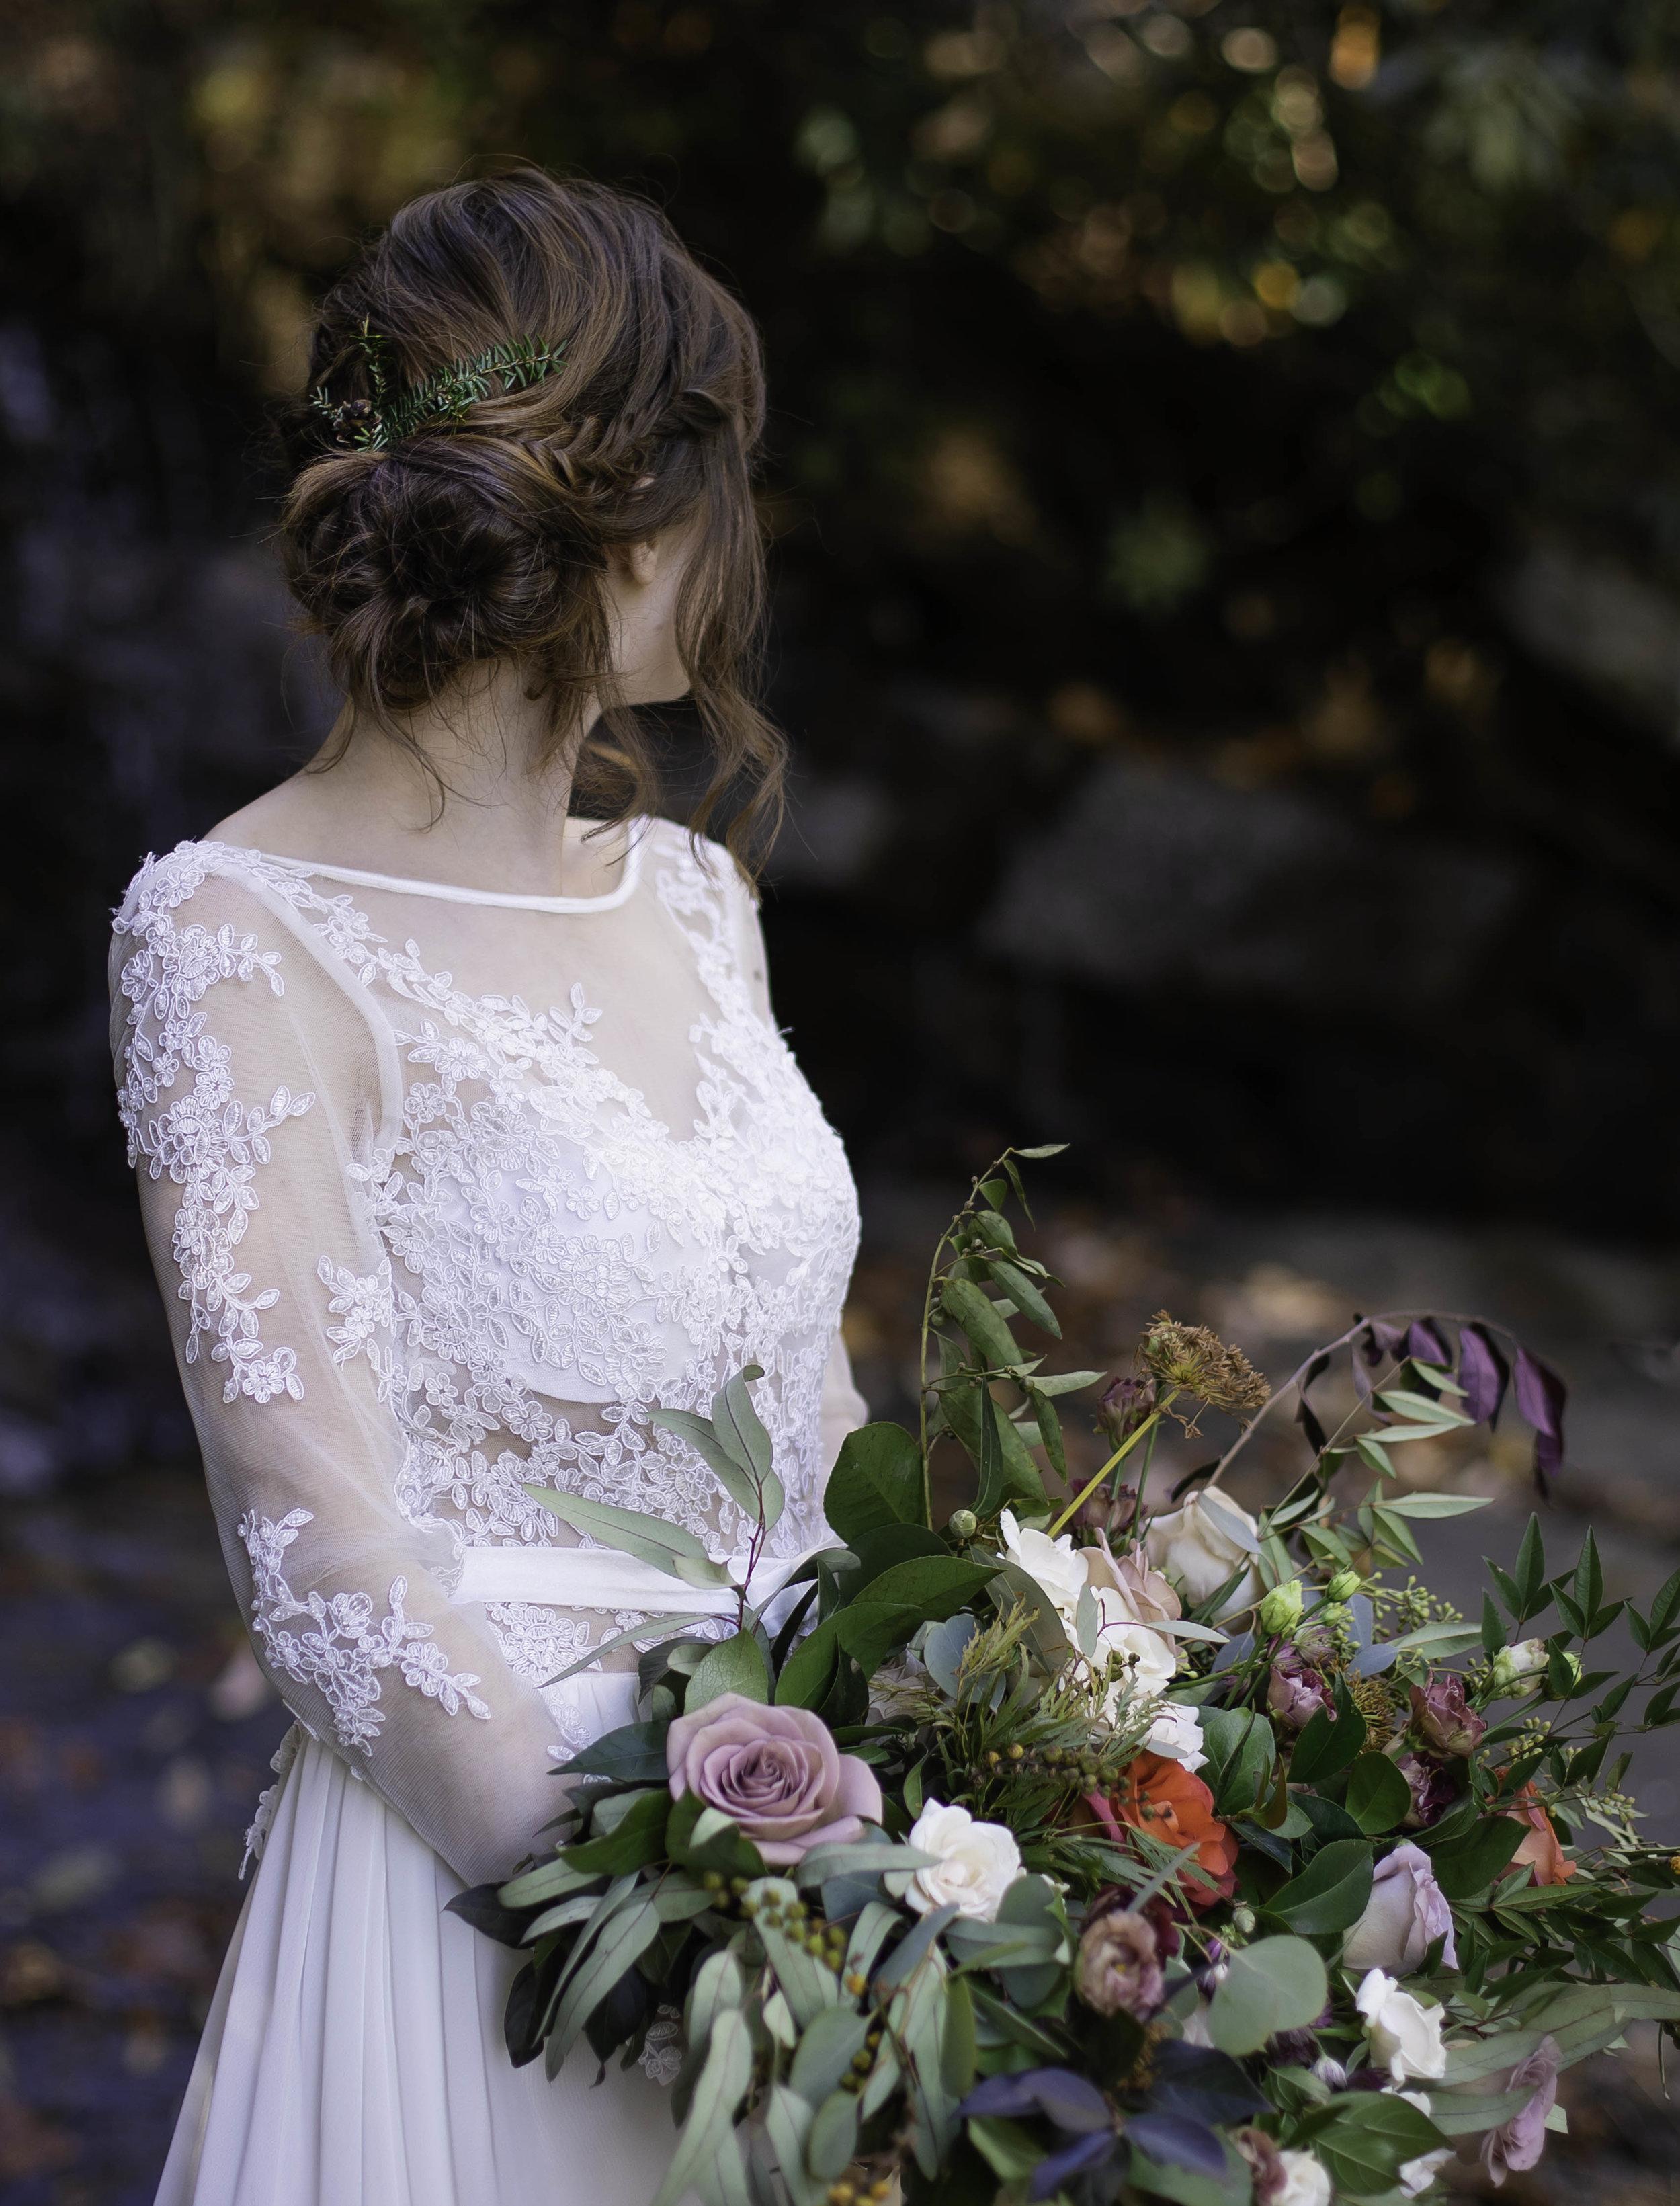 Laurel Falls Wedding October 2018_Allison and Josh__Lola Salon_Flora_Photo by Studio Misha Photography-85.5.jpg